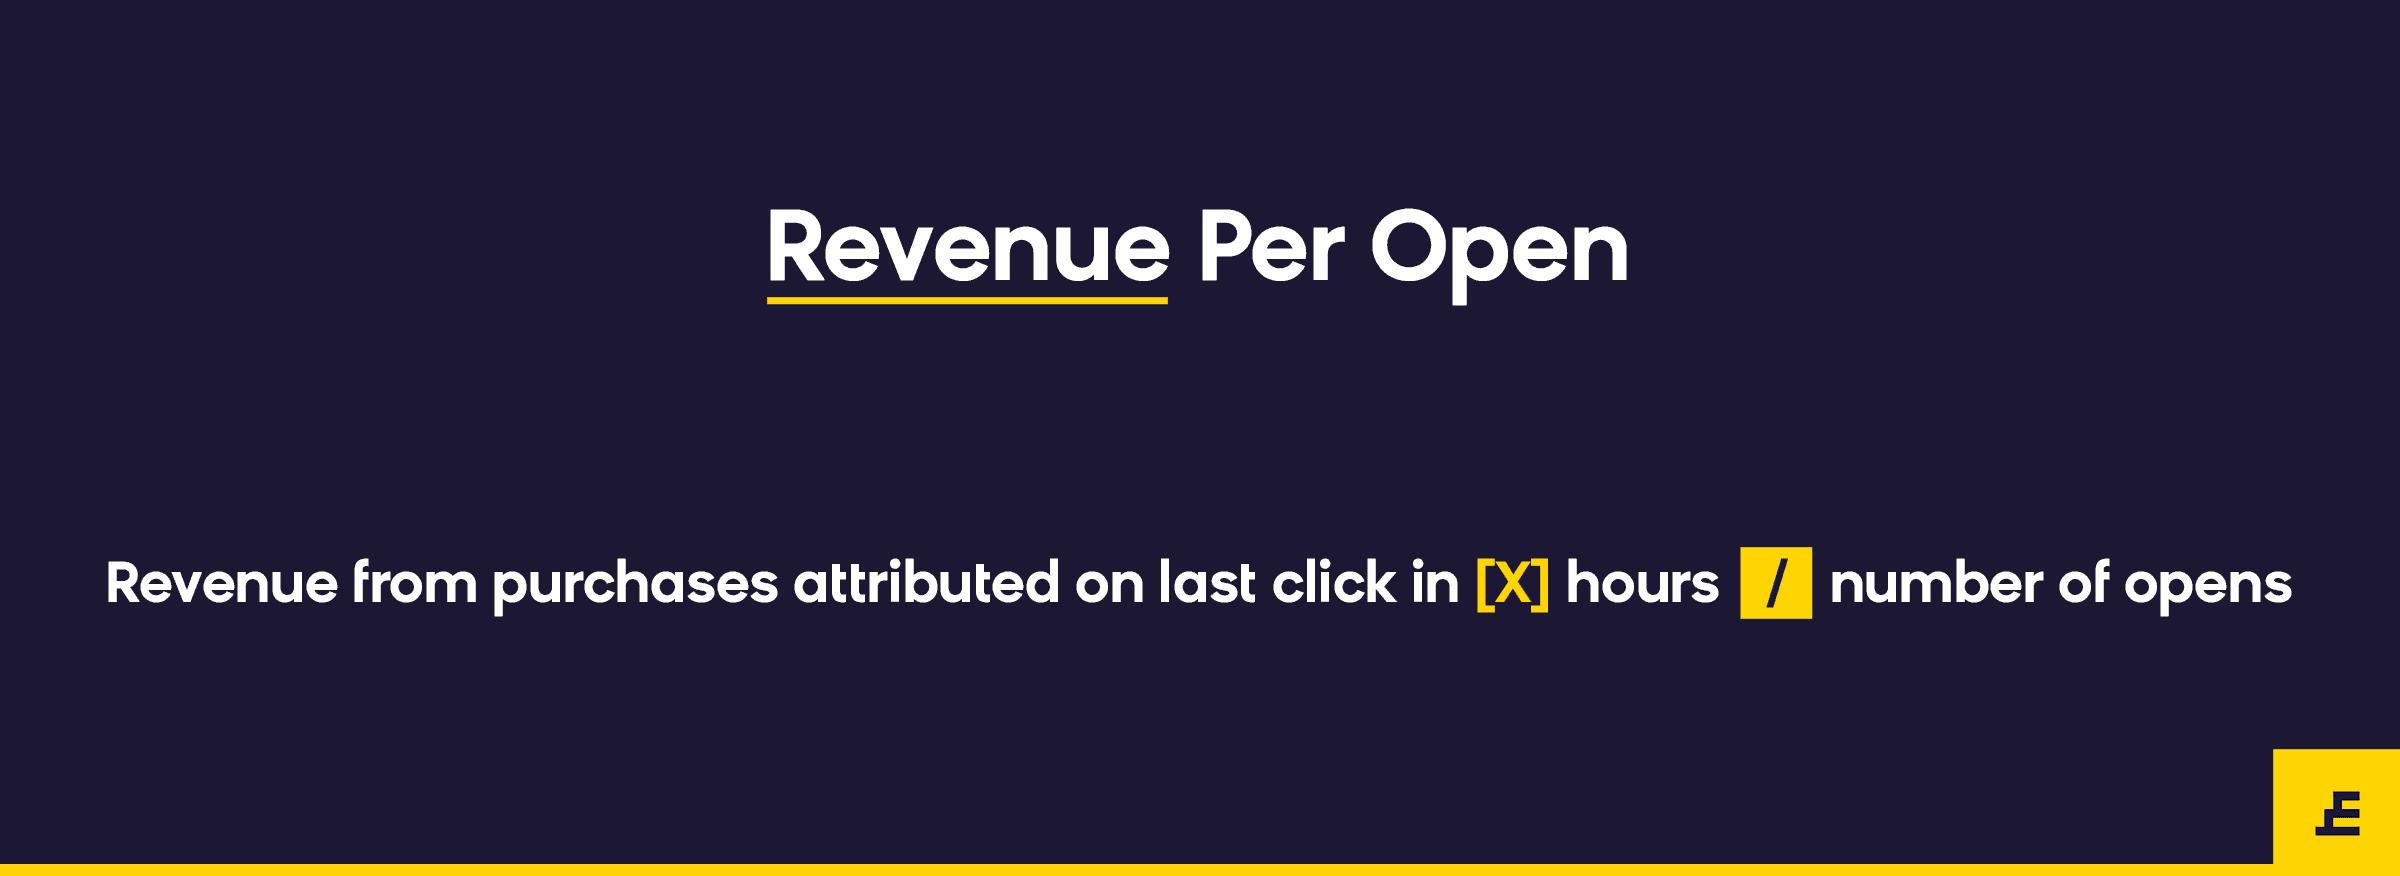 email marketing metric - revenue per open